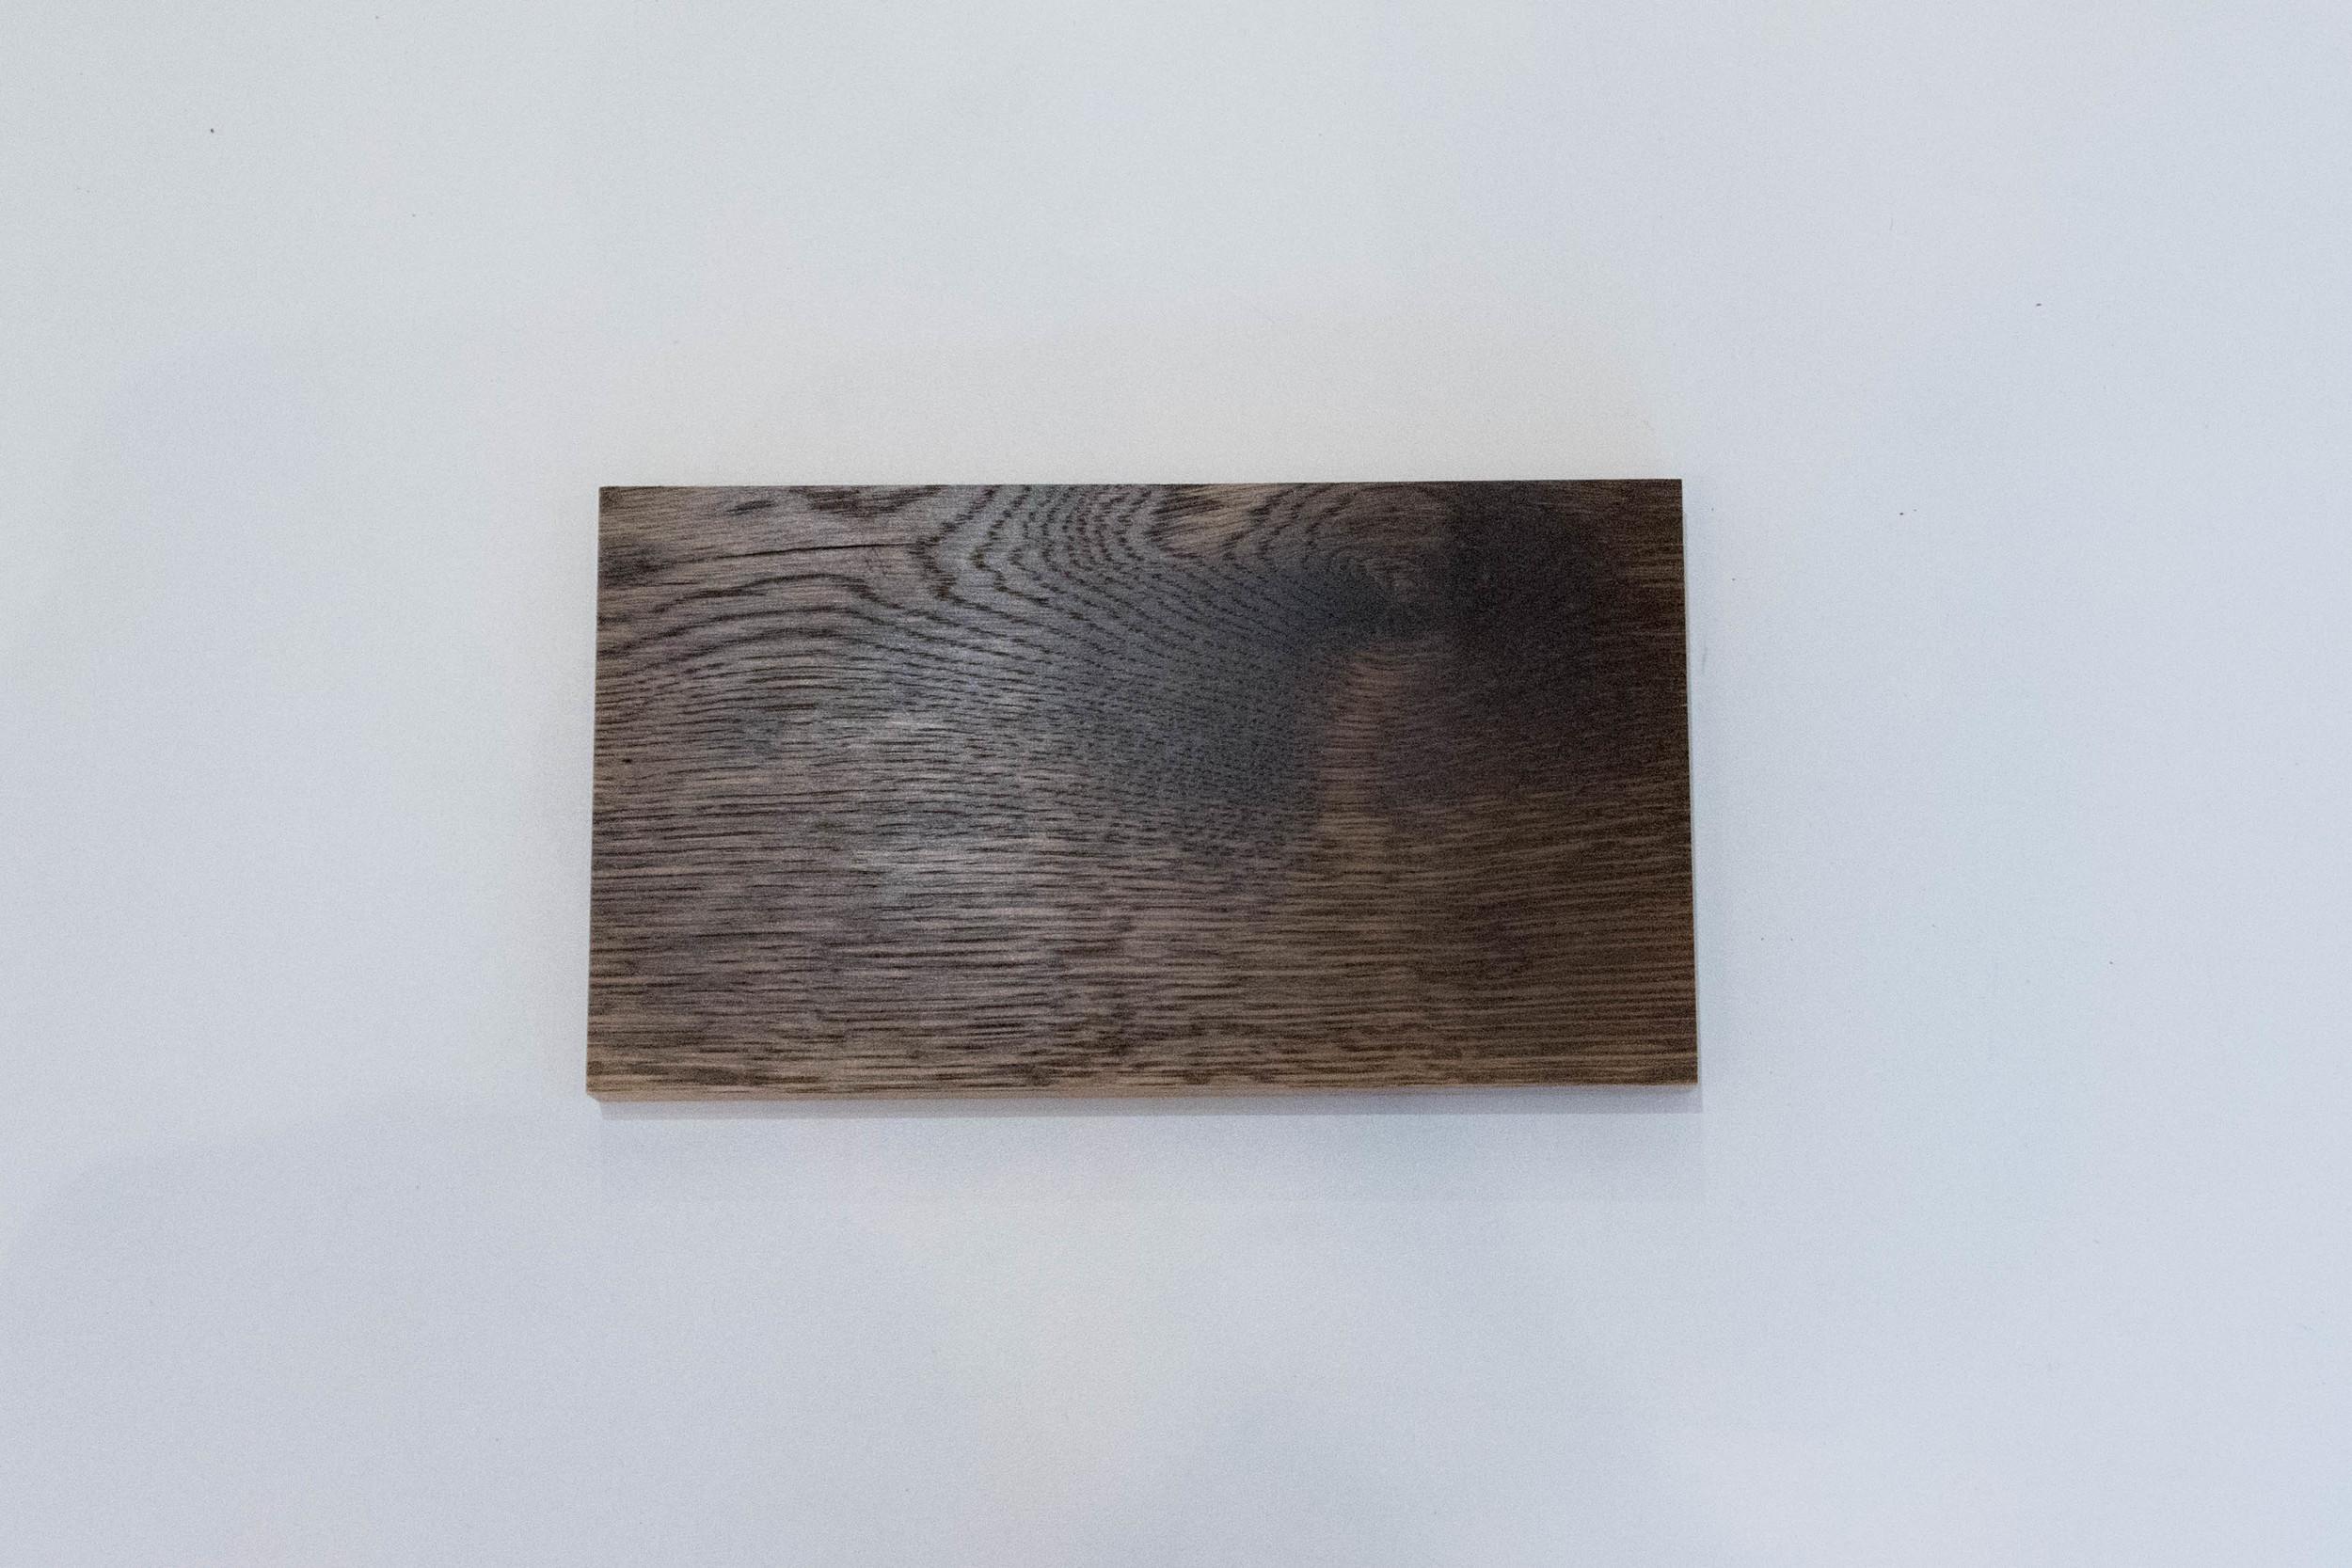 Oxidized Rustic White Oak